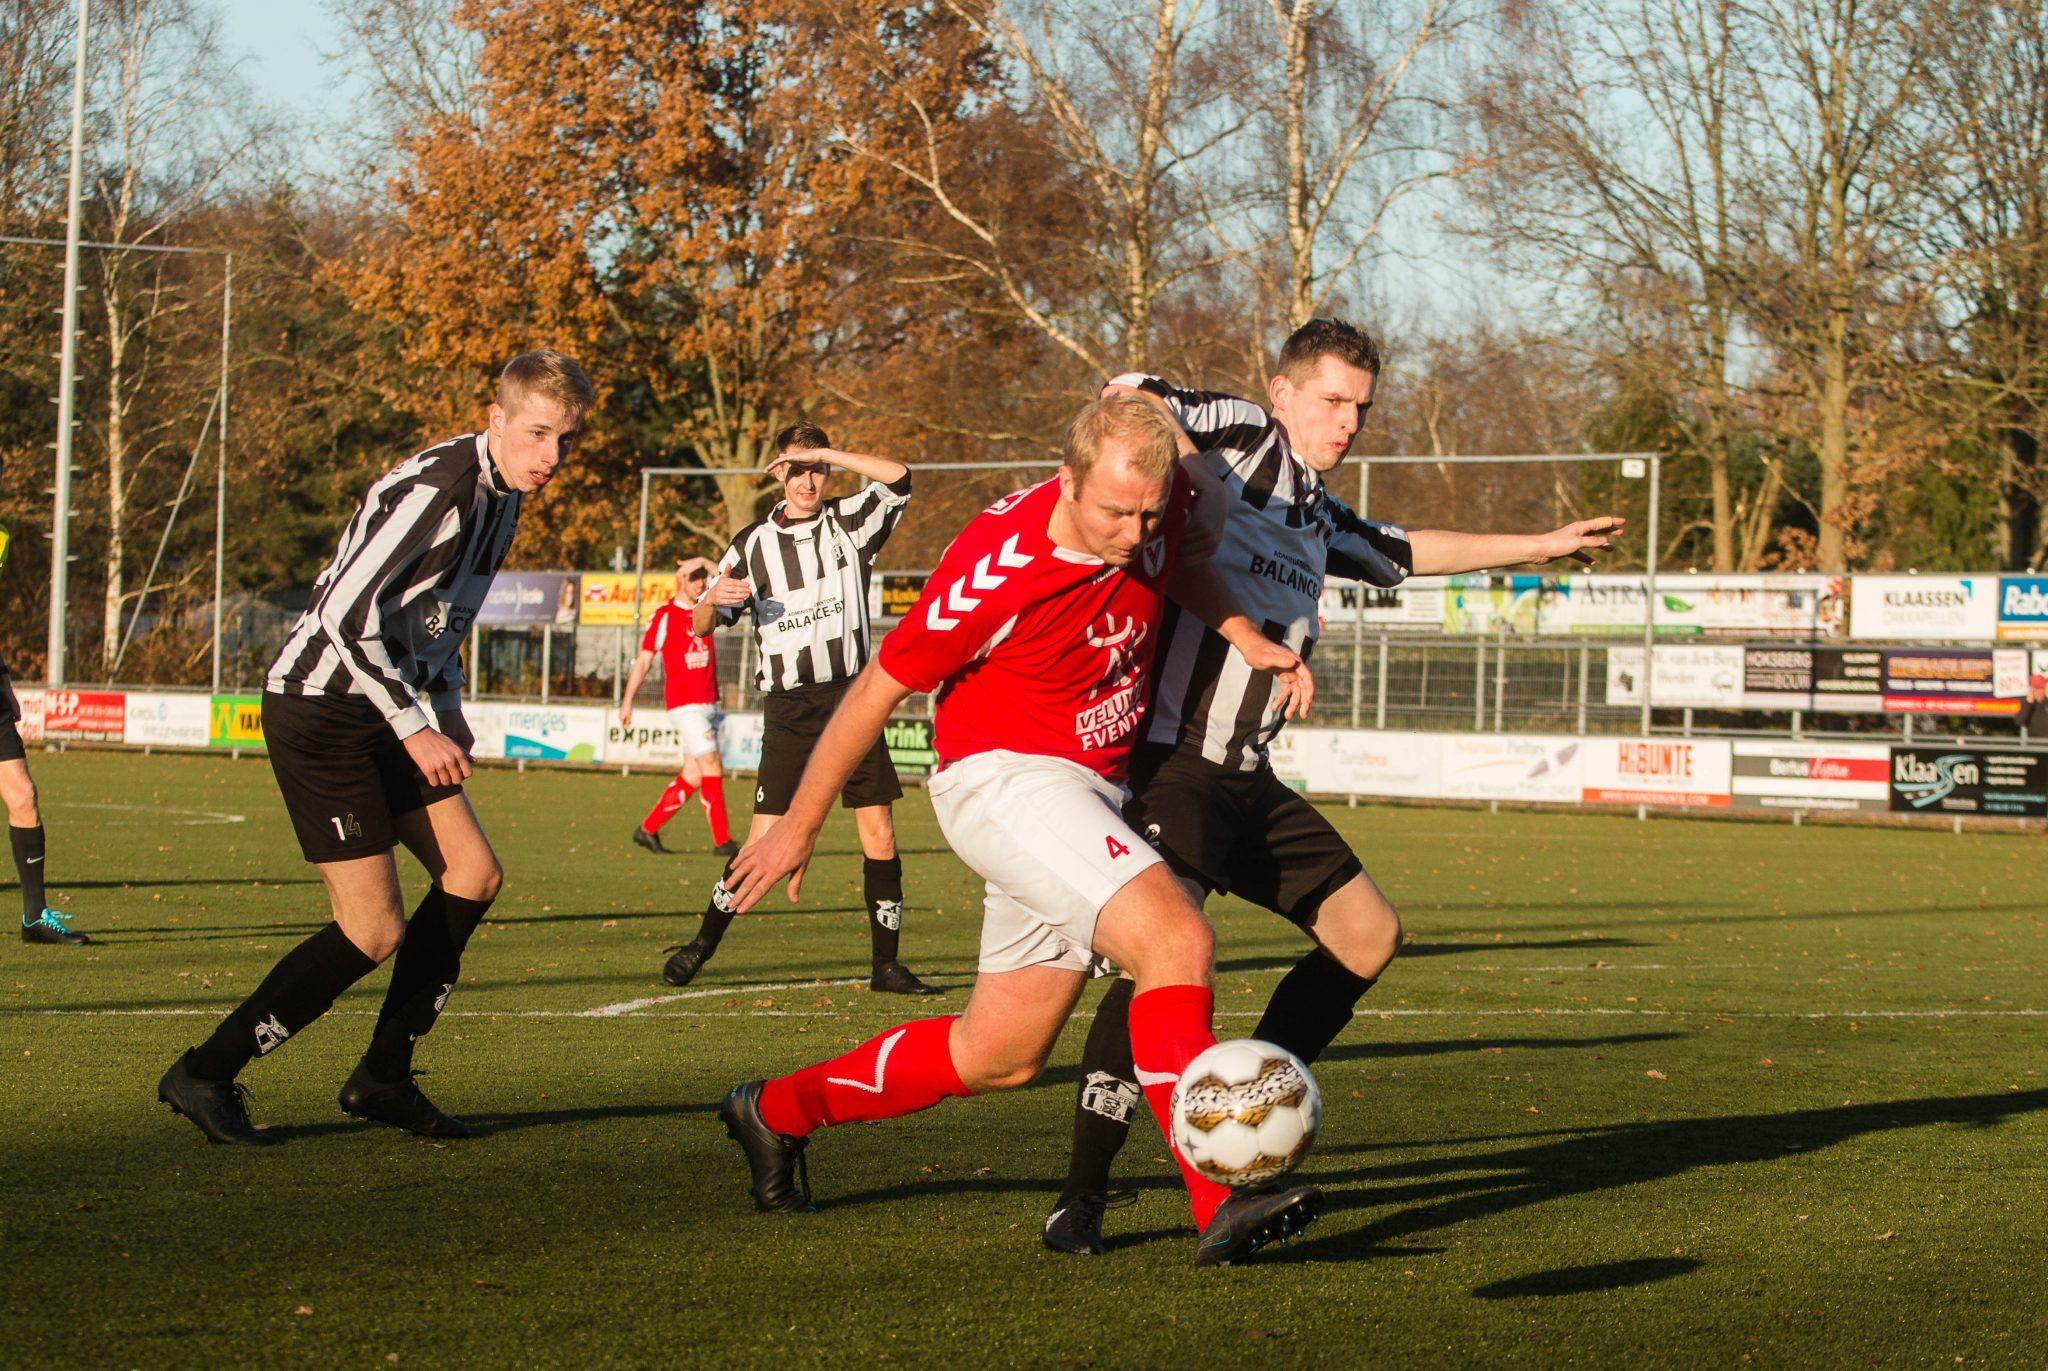 Hulshorst geeft overwinning weg in slotfase